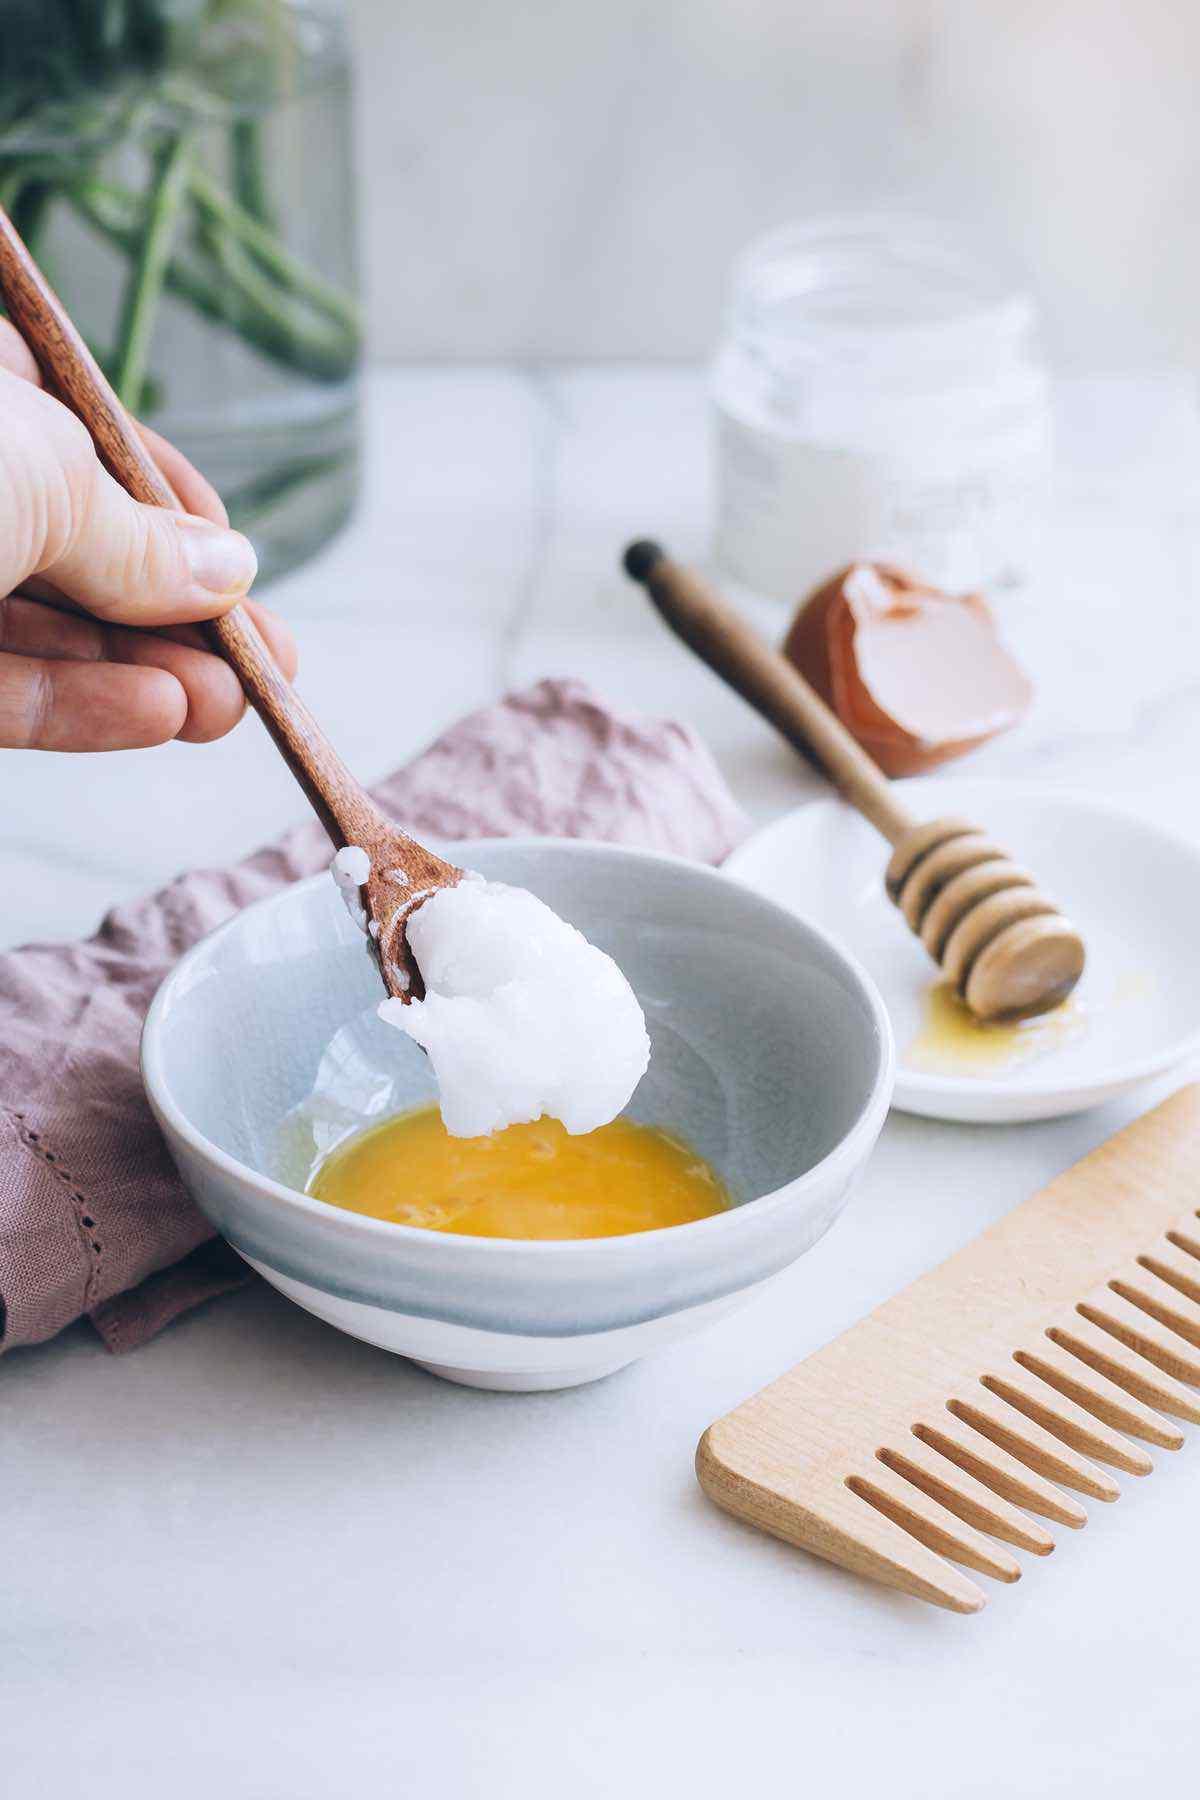 DIY Coconut Oil Hair Mask for the Softest Hair Ever